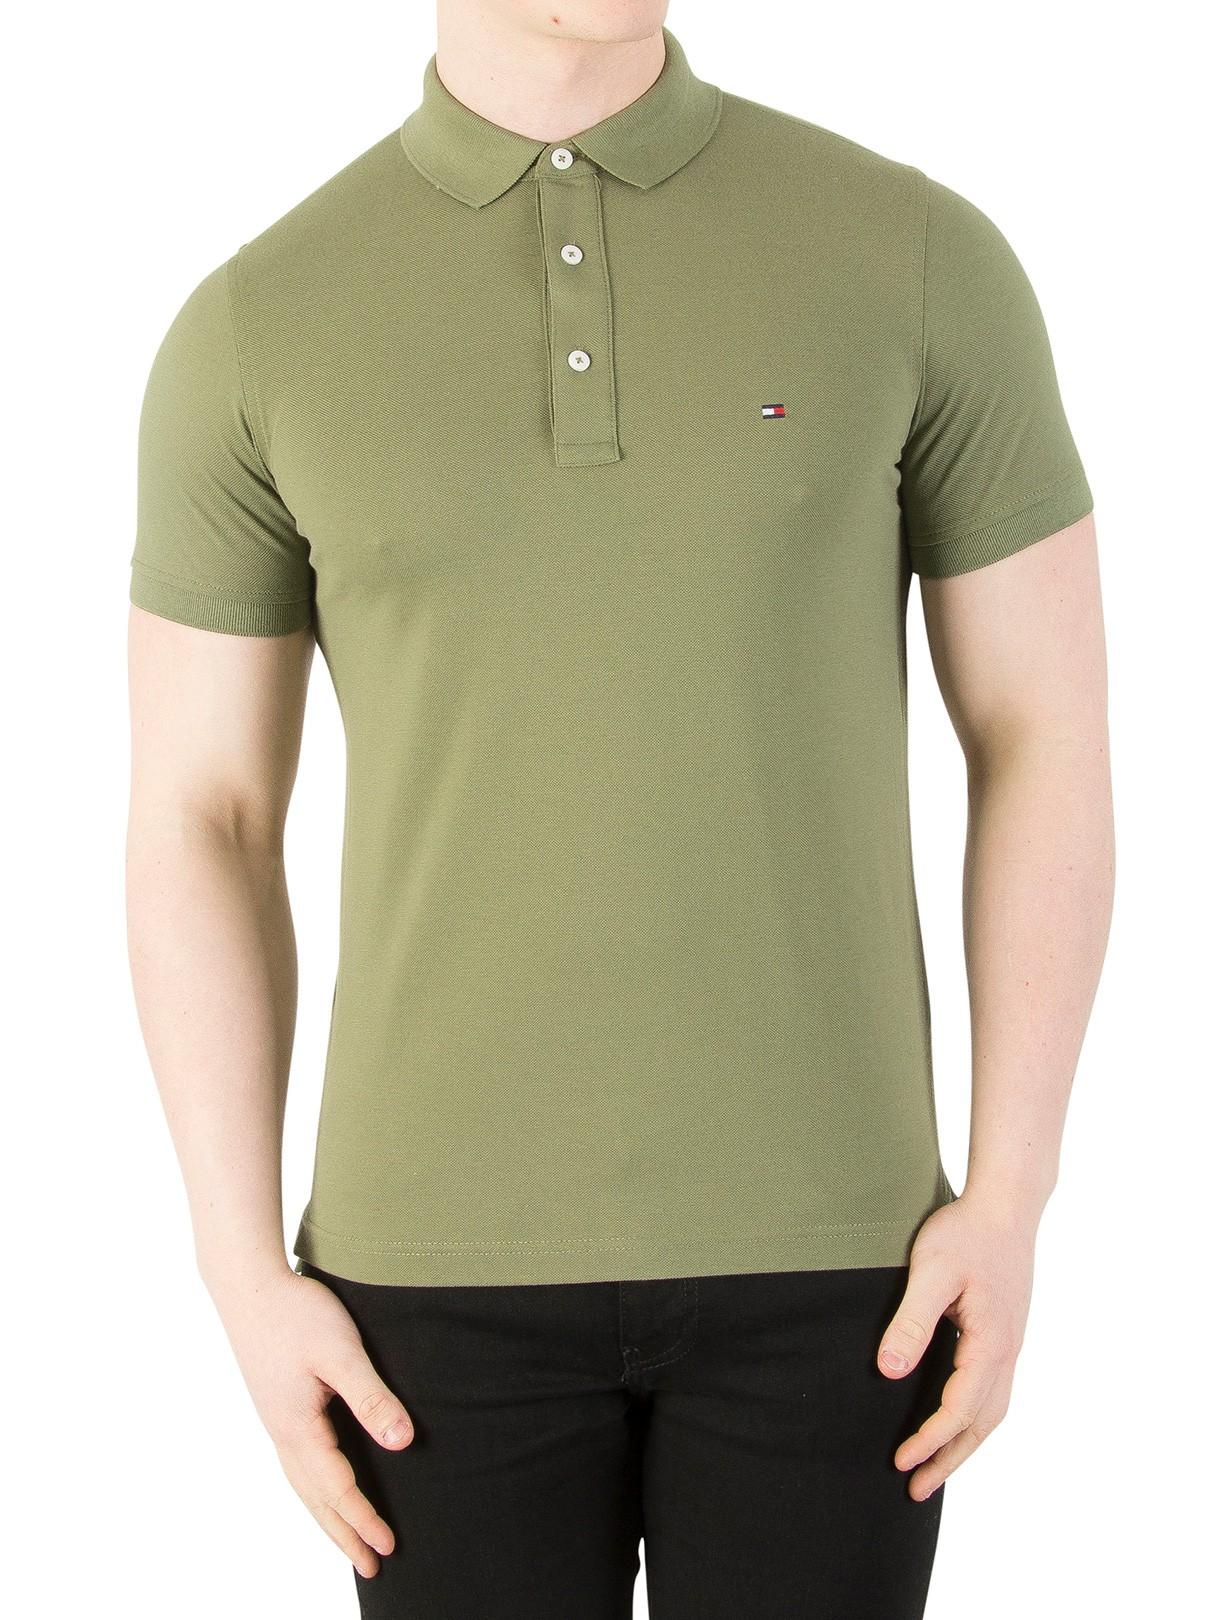 92a2f73d7294 Tommy Hilfiger Mens Custom Fit Logo Polo Shirt